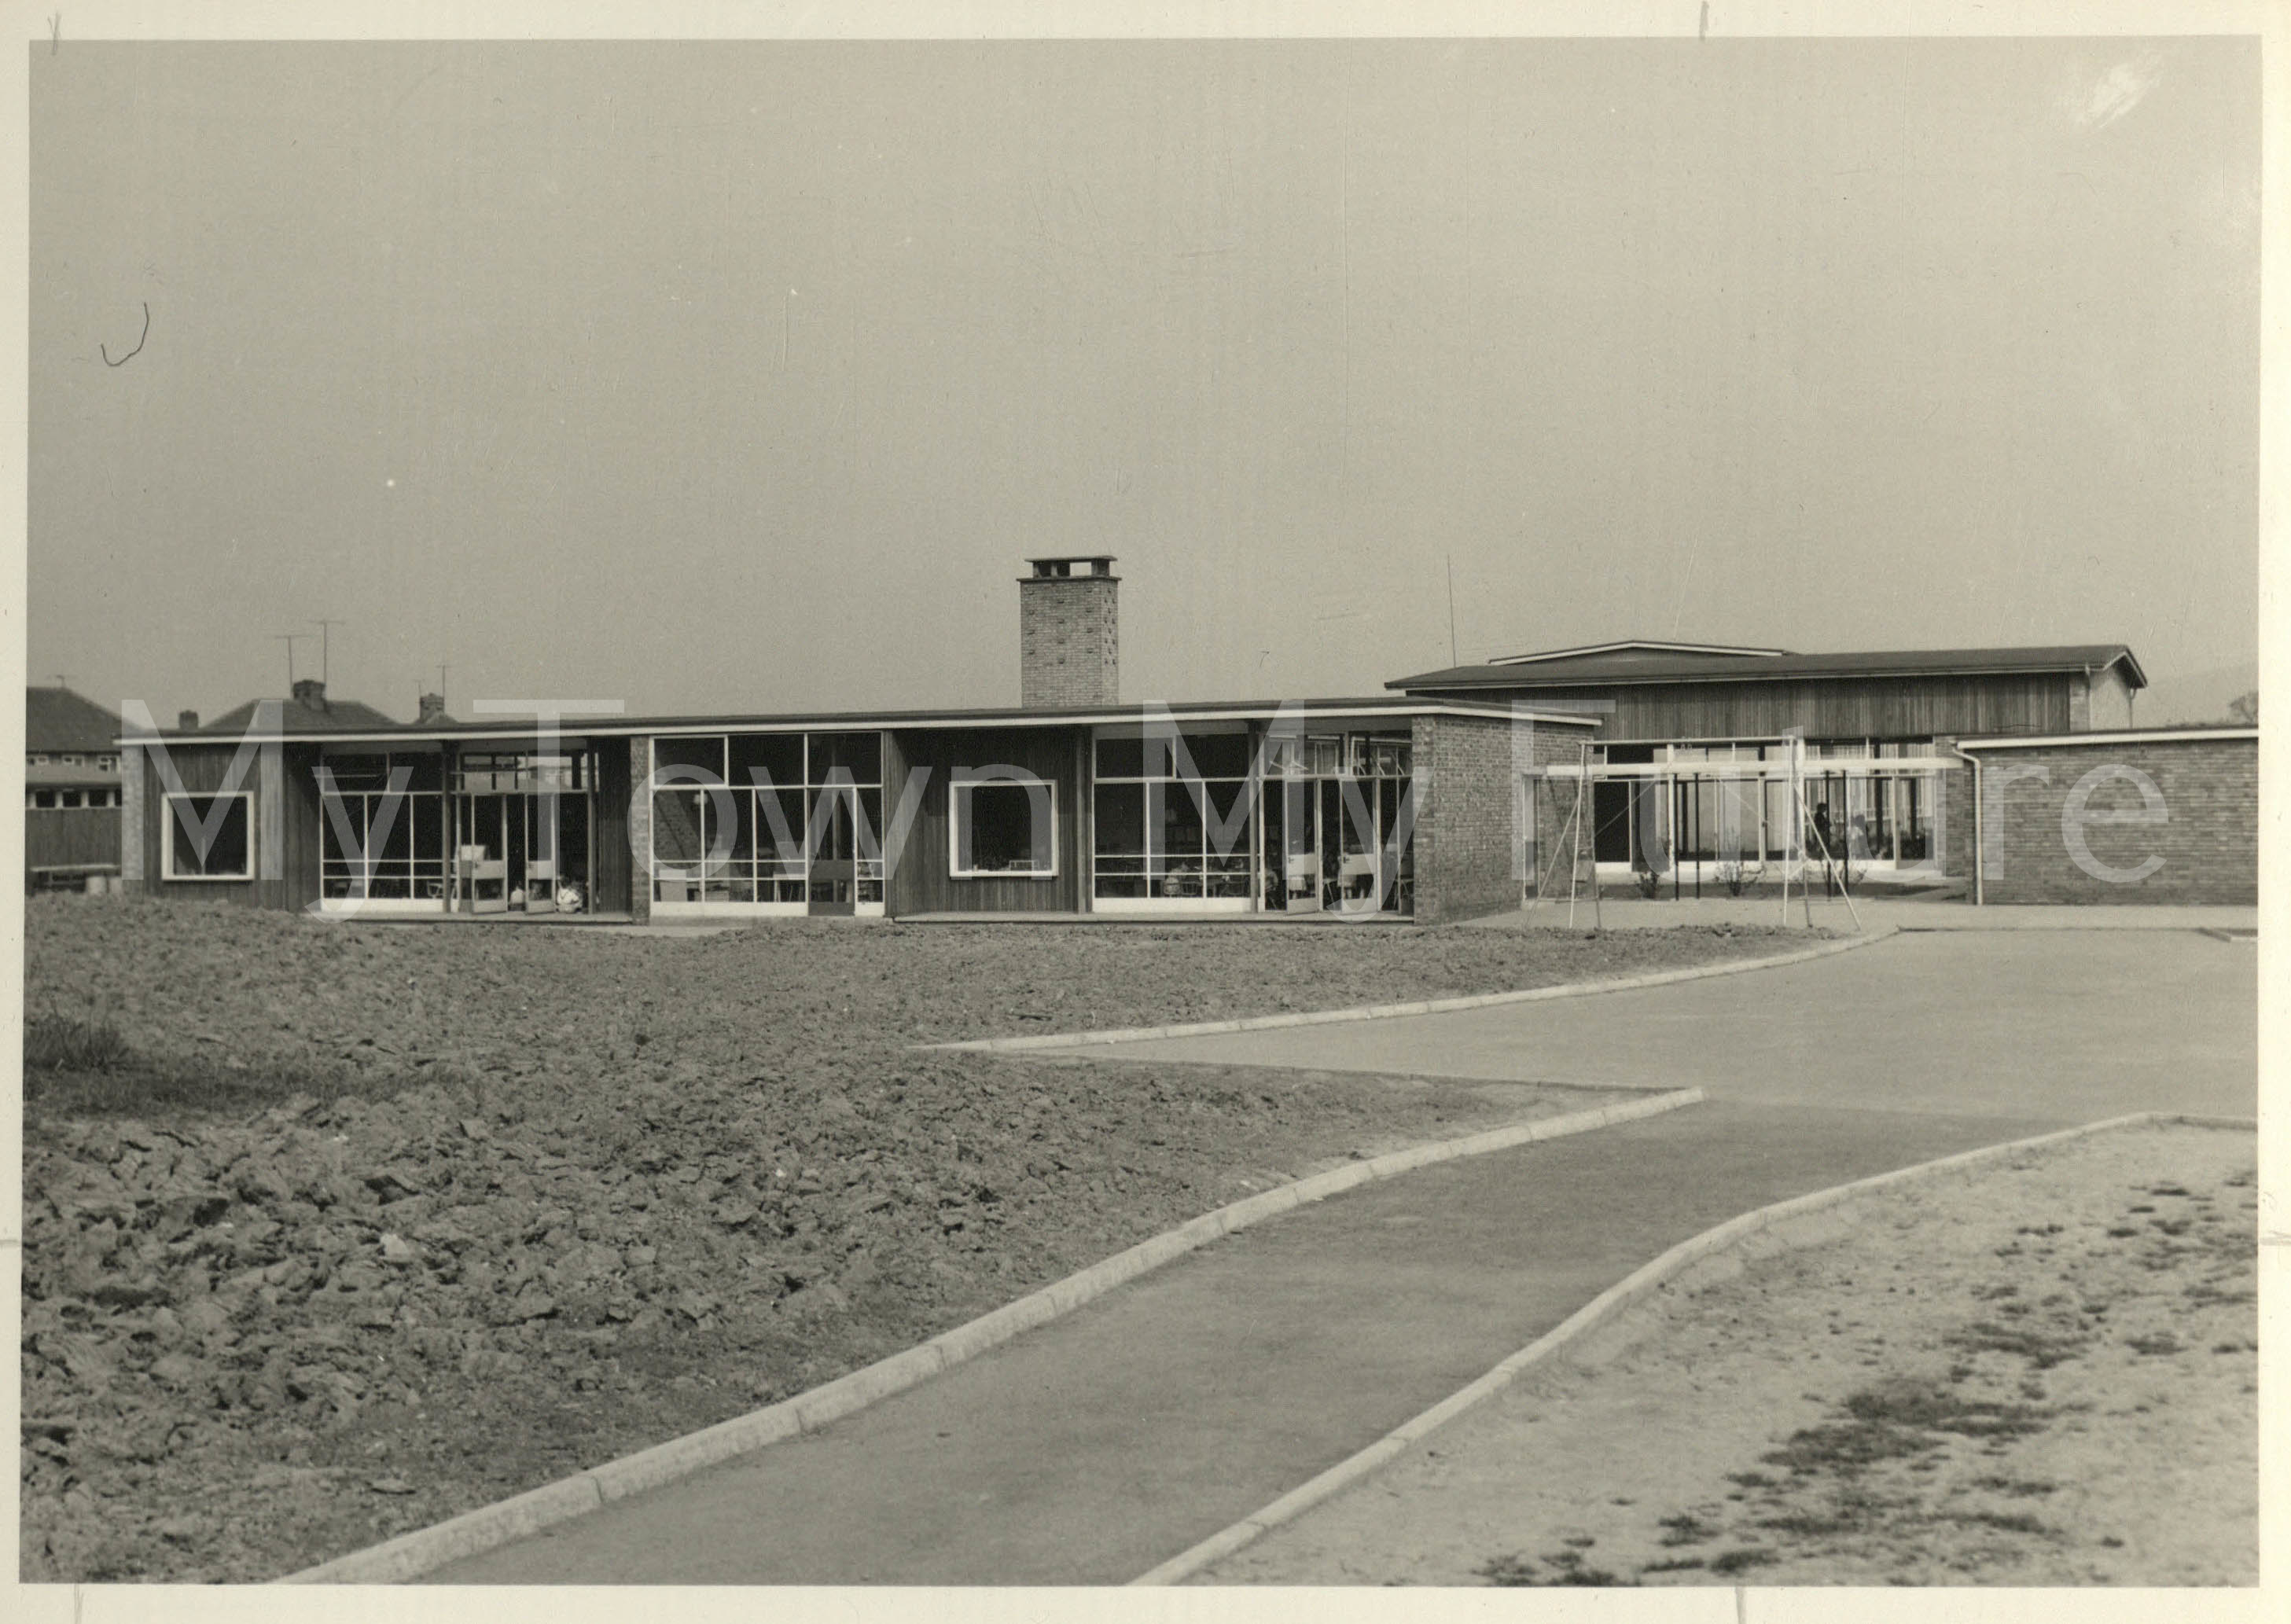 Ladgate Primary School